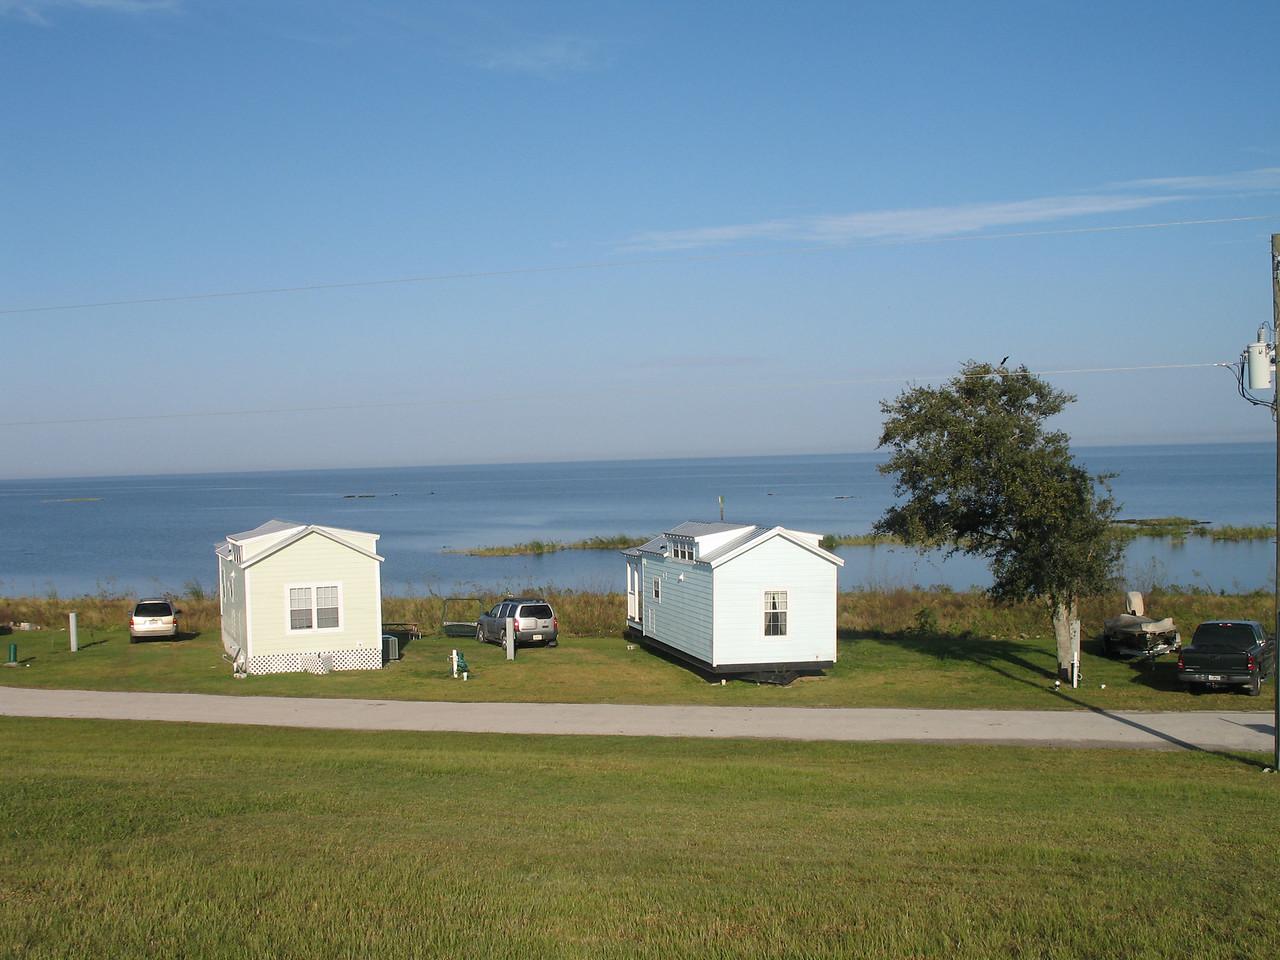 Cabins at Everglades Adventures (Sandra Friend)